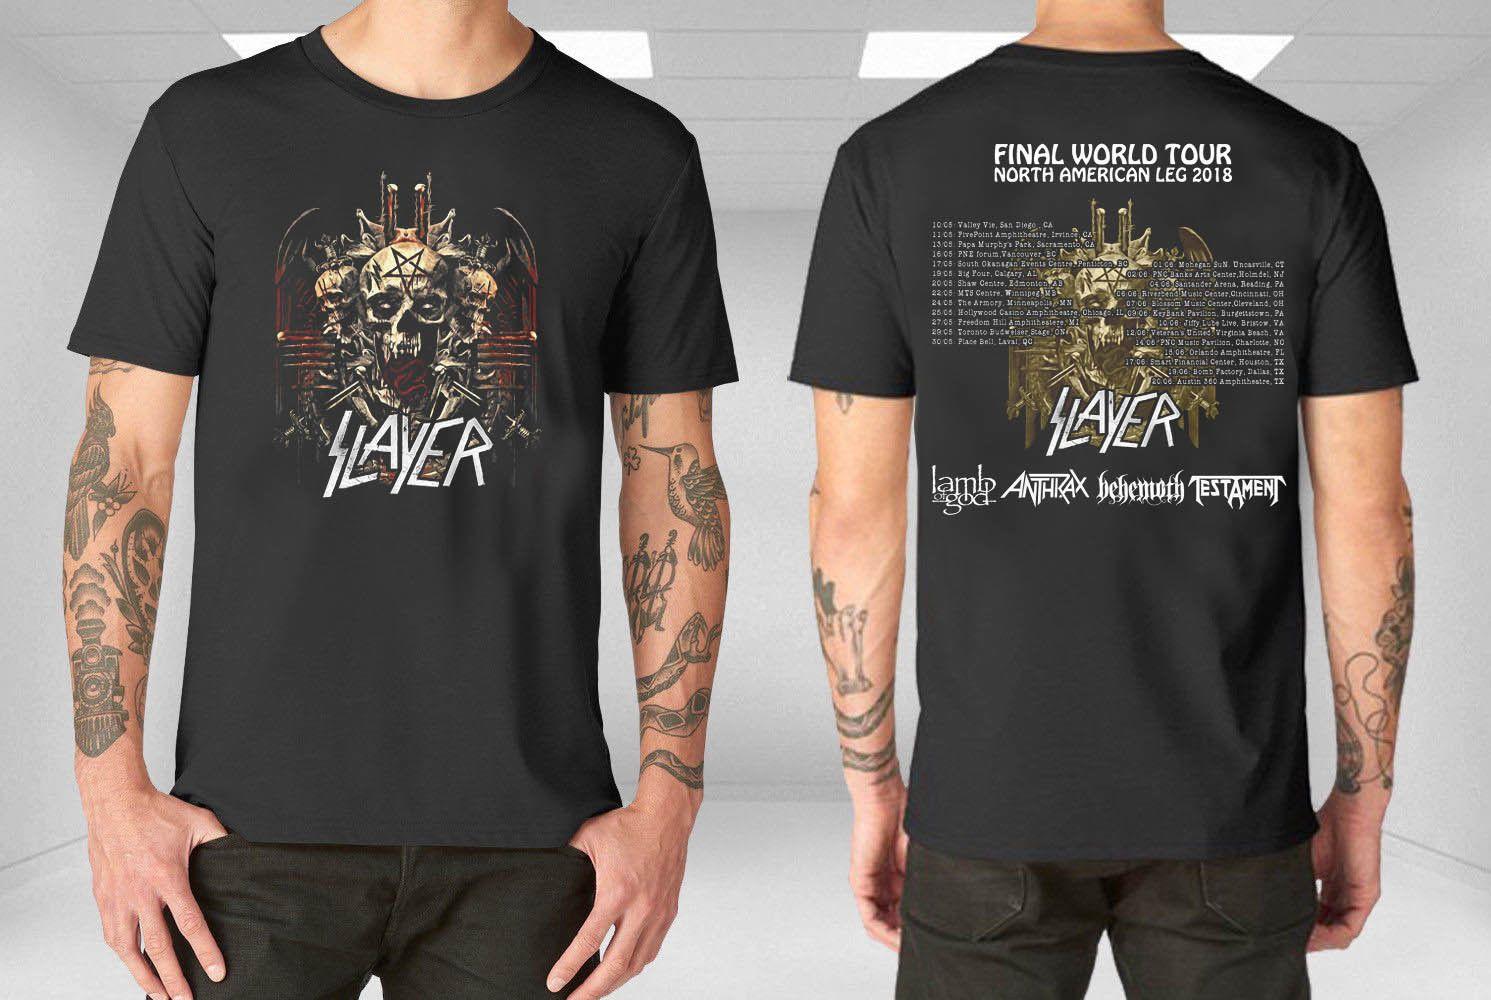 2ccf3c3b126 Slayer T Shirt Final World Tour 2018 North America Leg Lamb Of God Anthrax  HOT SELL 2018 New Fashion Brand Men Tees Solid Color Short T Shirts  Shopping ...